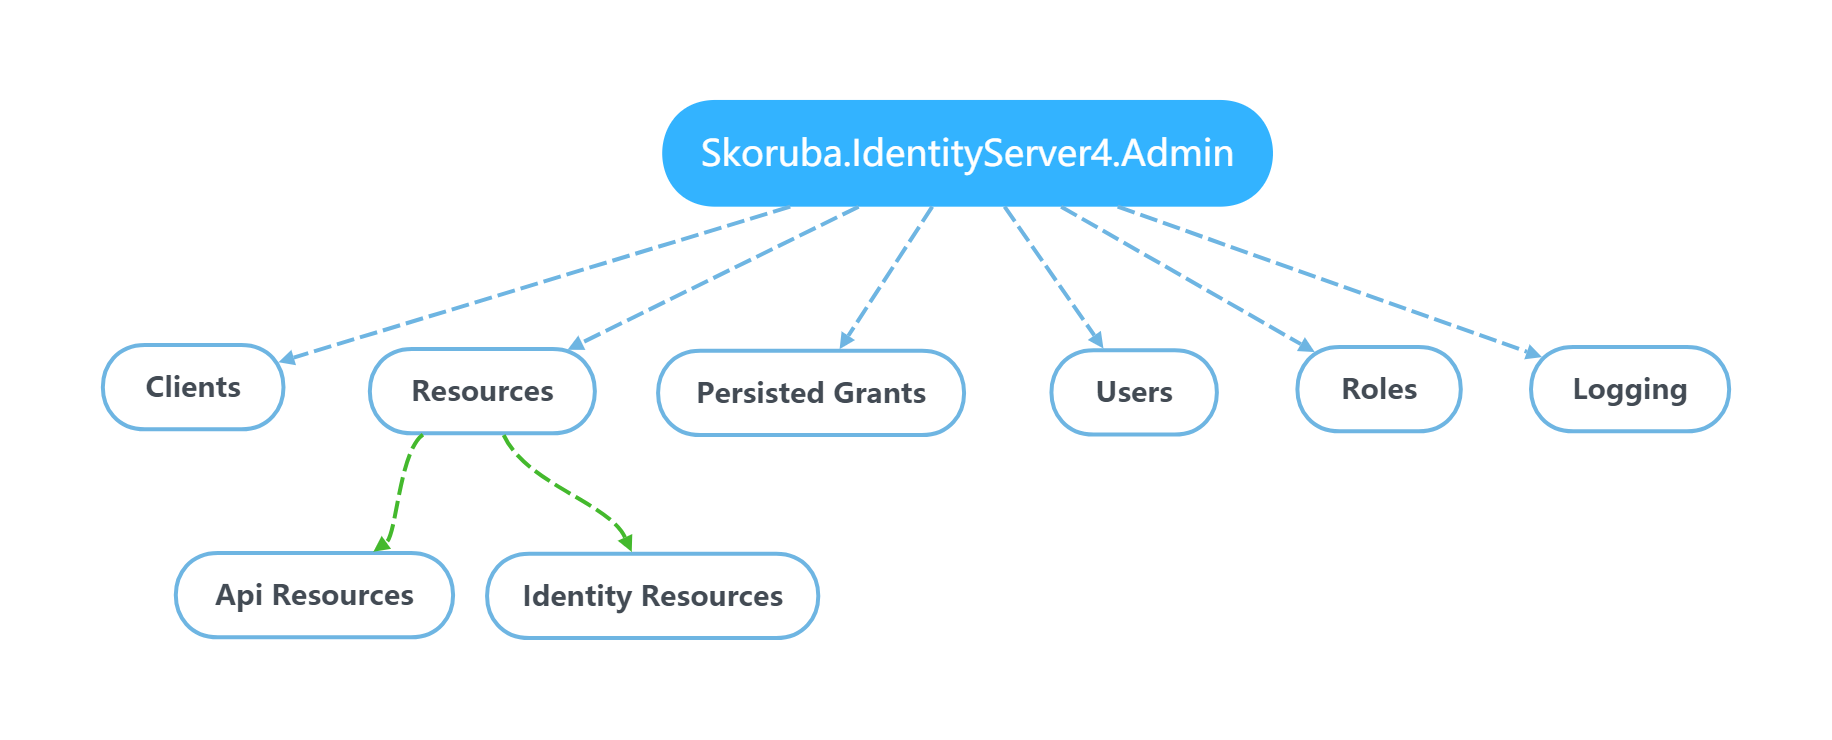 Skoruba.IdentityServer4.Admin App